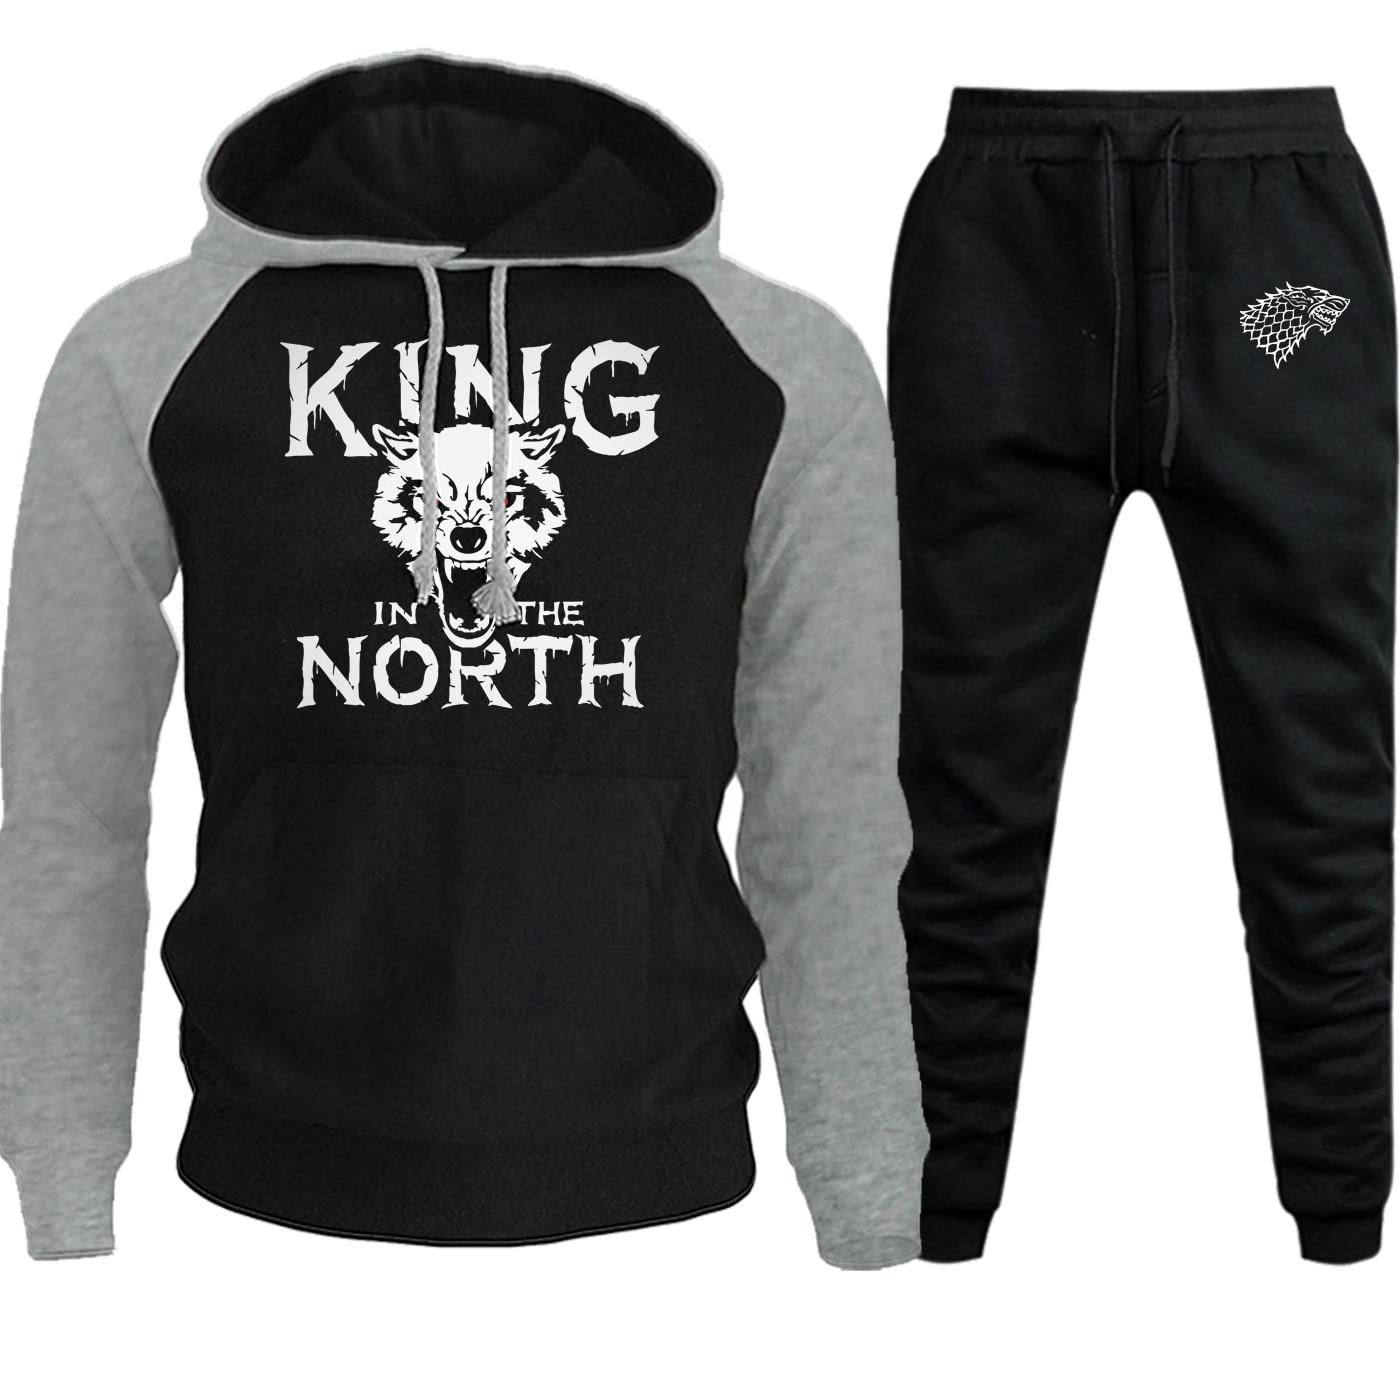 Game Of Thrones Print Autumn Winter Streetwear Men Raglan Hoodie House Of Thrones Suit Casual Fleece Hooded+Pants 2 Piece Set